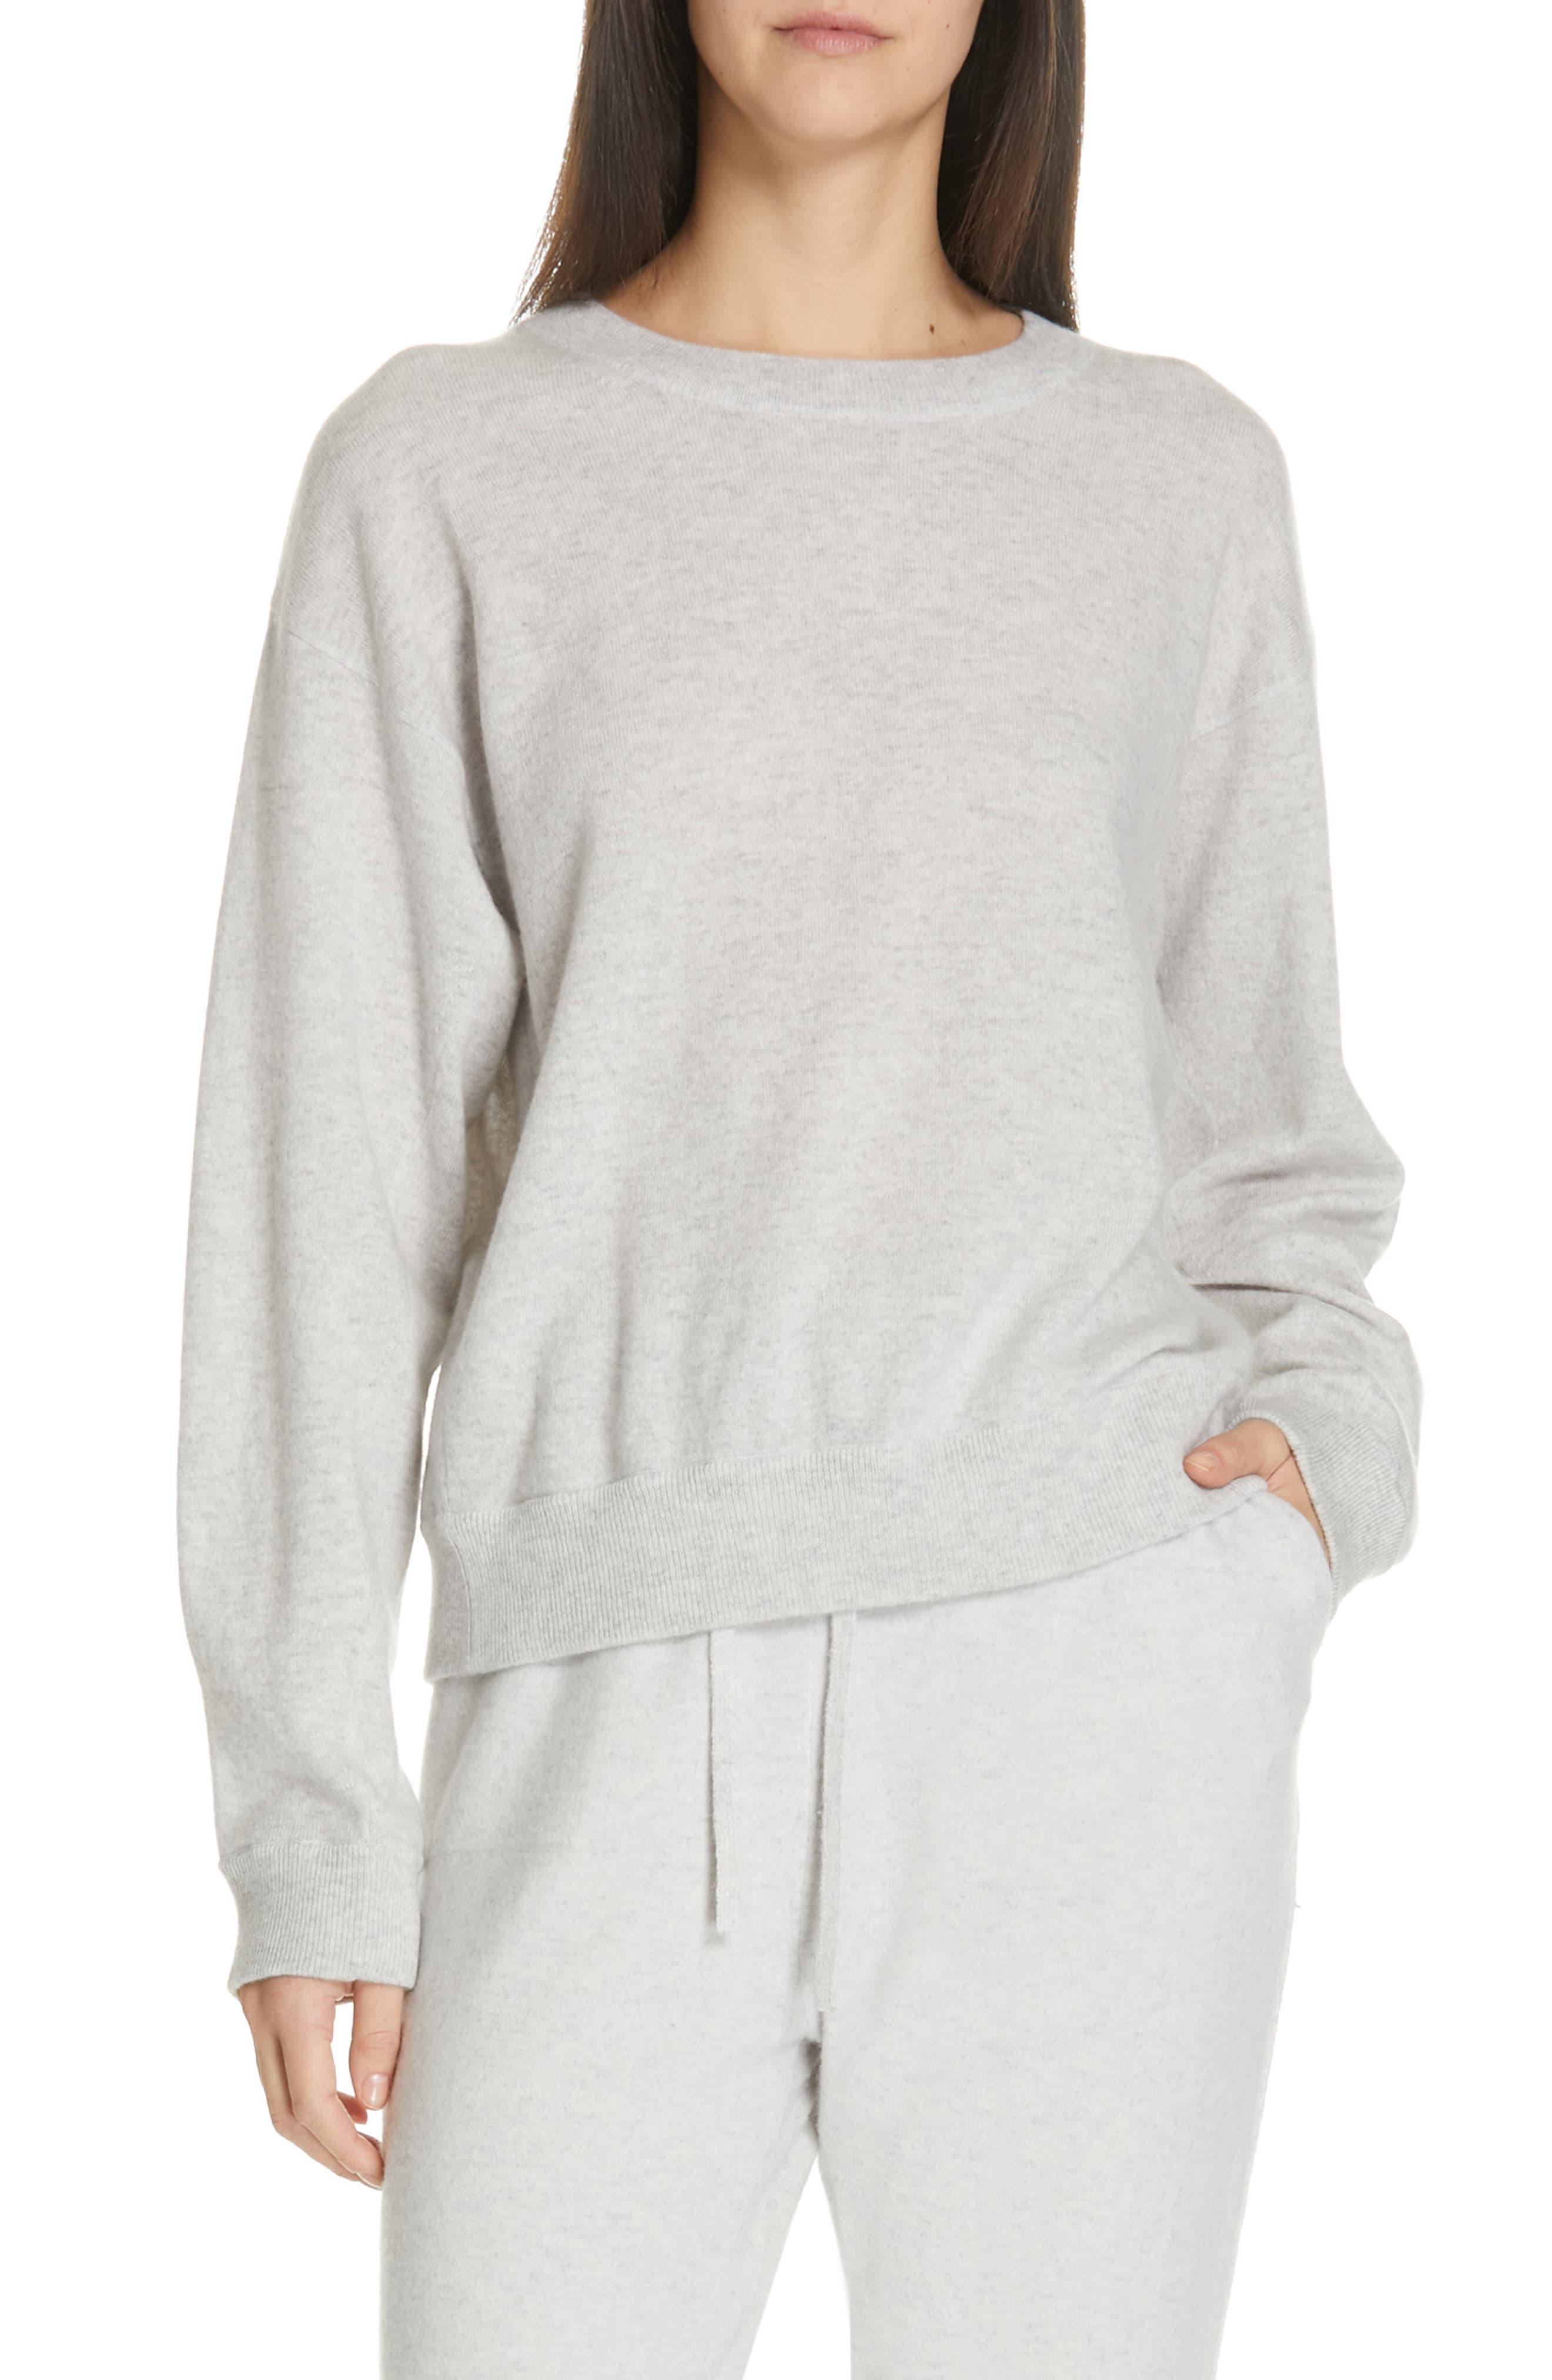 VINCE Boxy Cashmere Sweater, Main, color, LIGHT HEATHER GREY